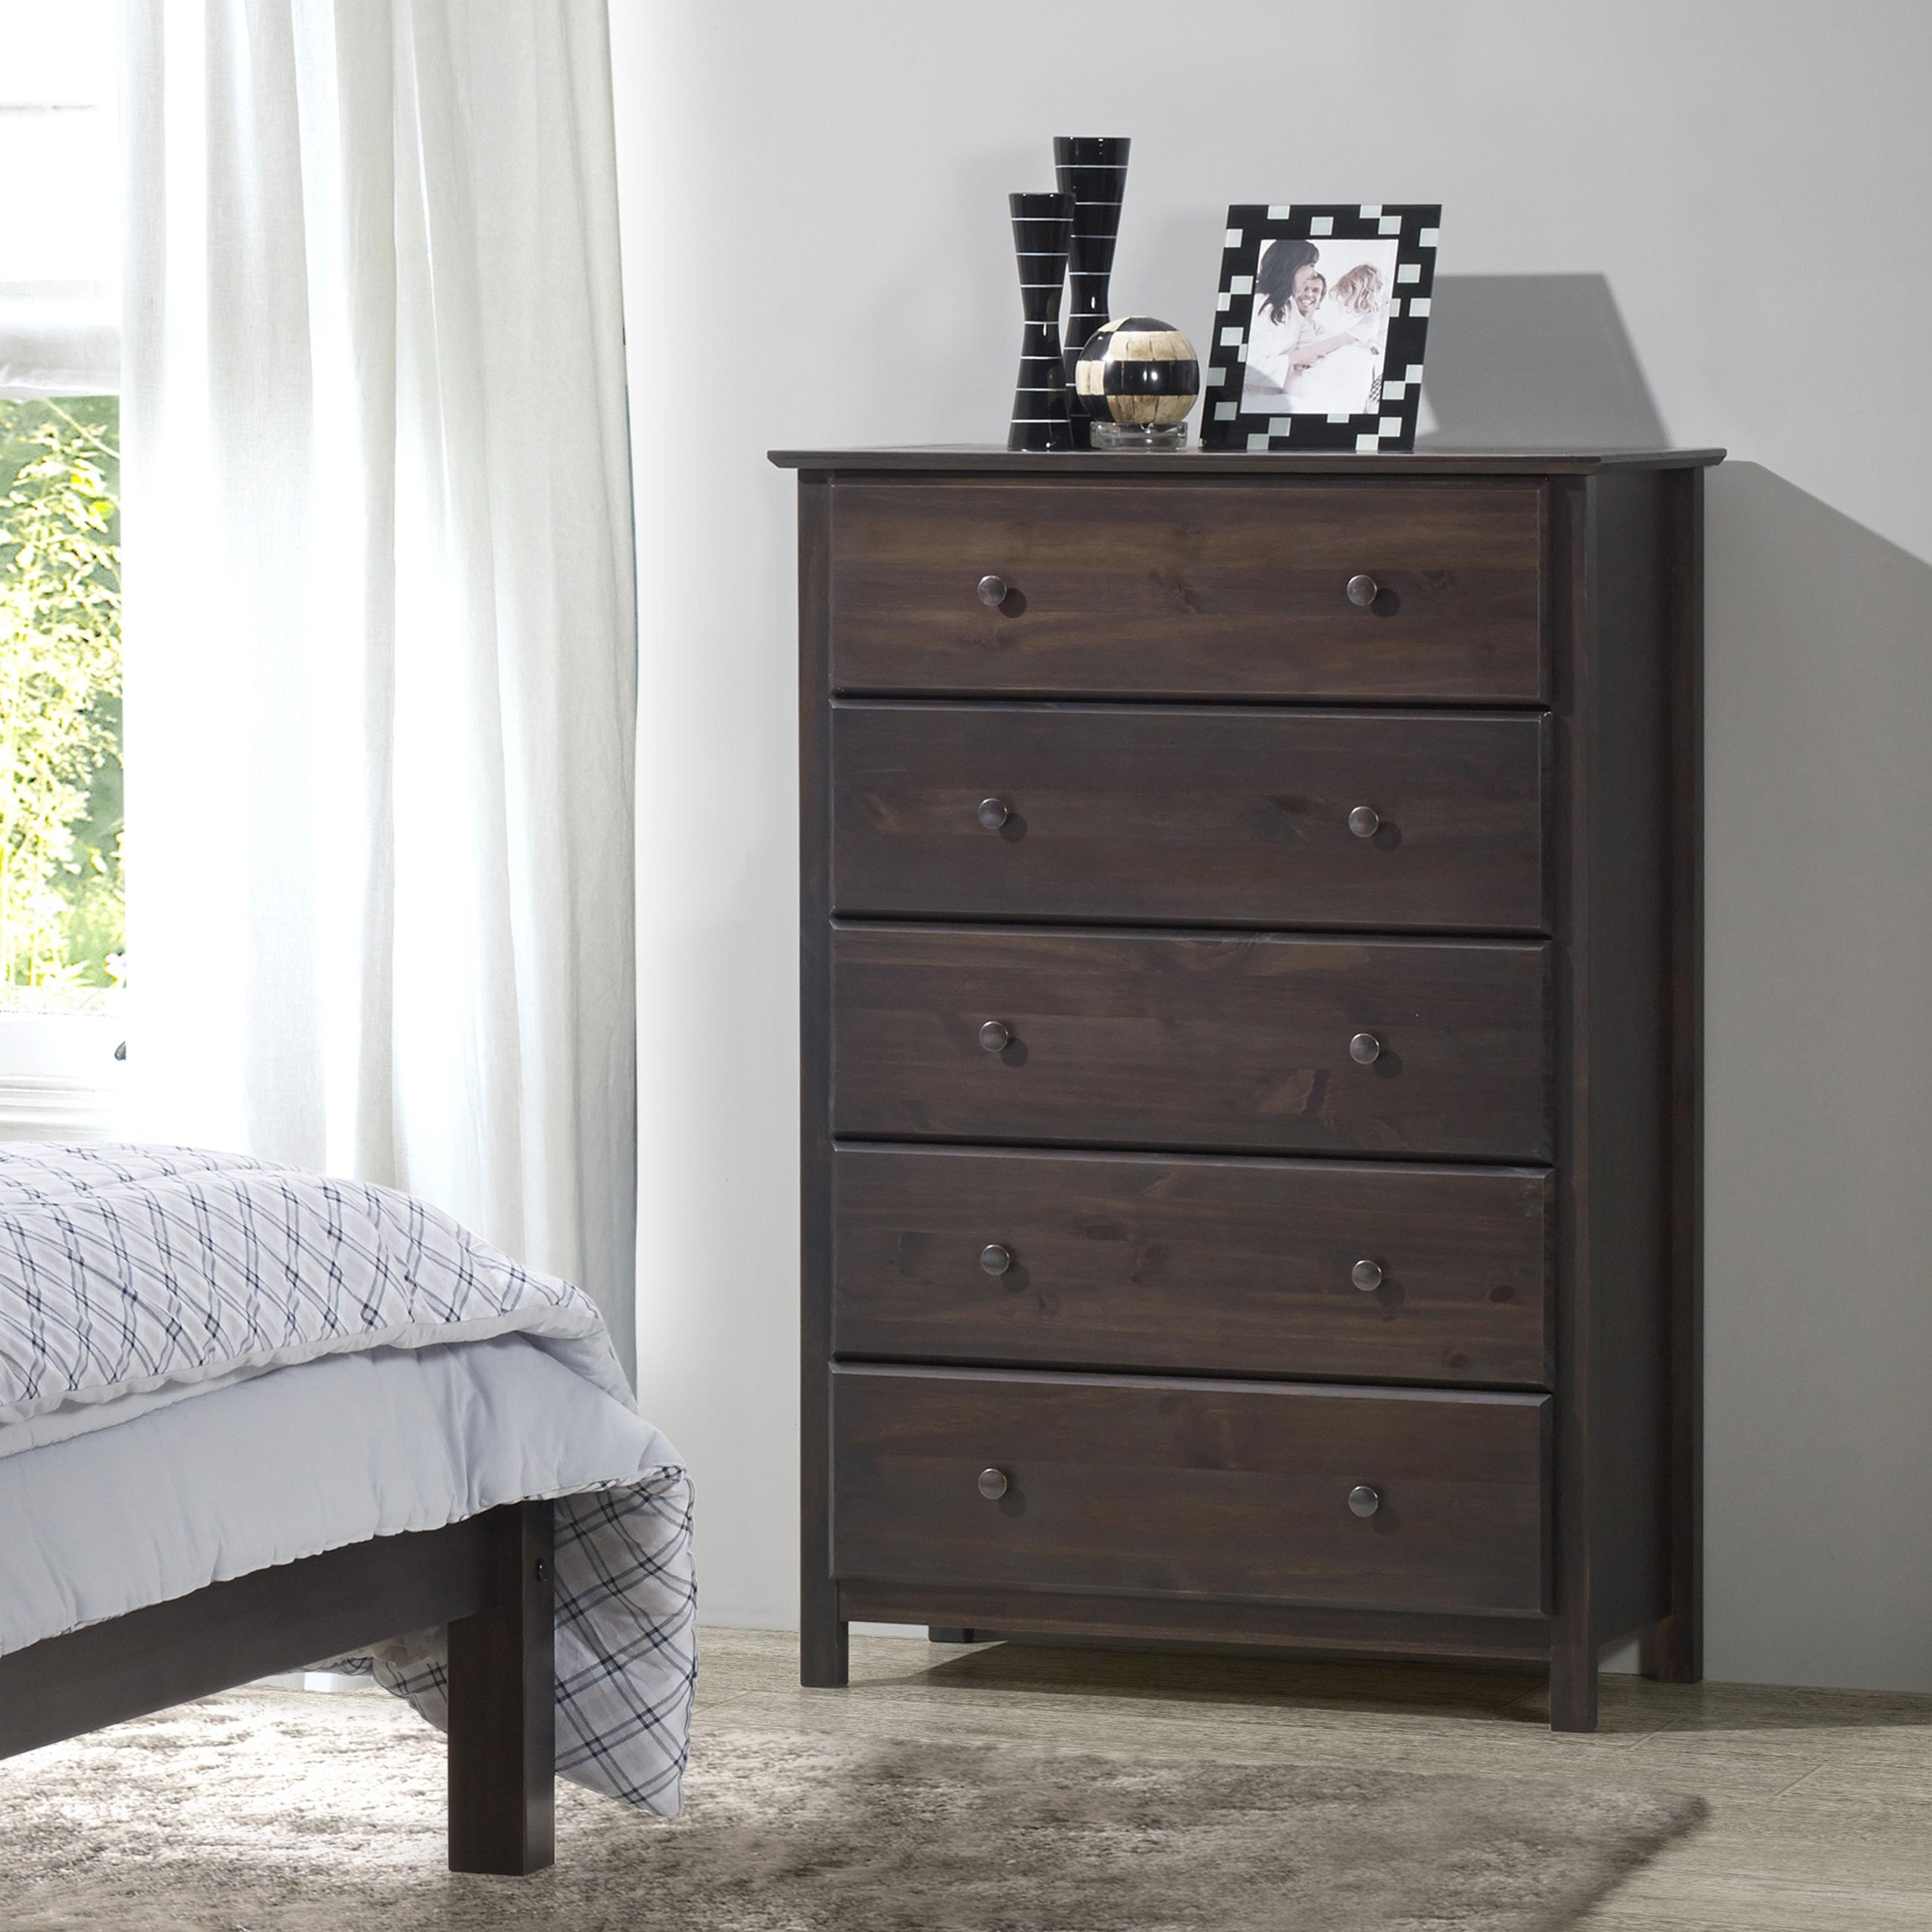 Shop Grain Wood Furniture Shaker 5 Drawer Solid Wood Chest